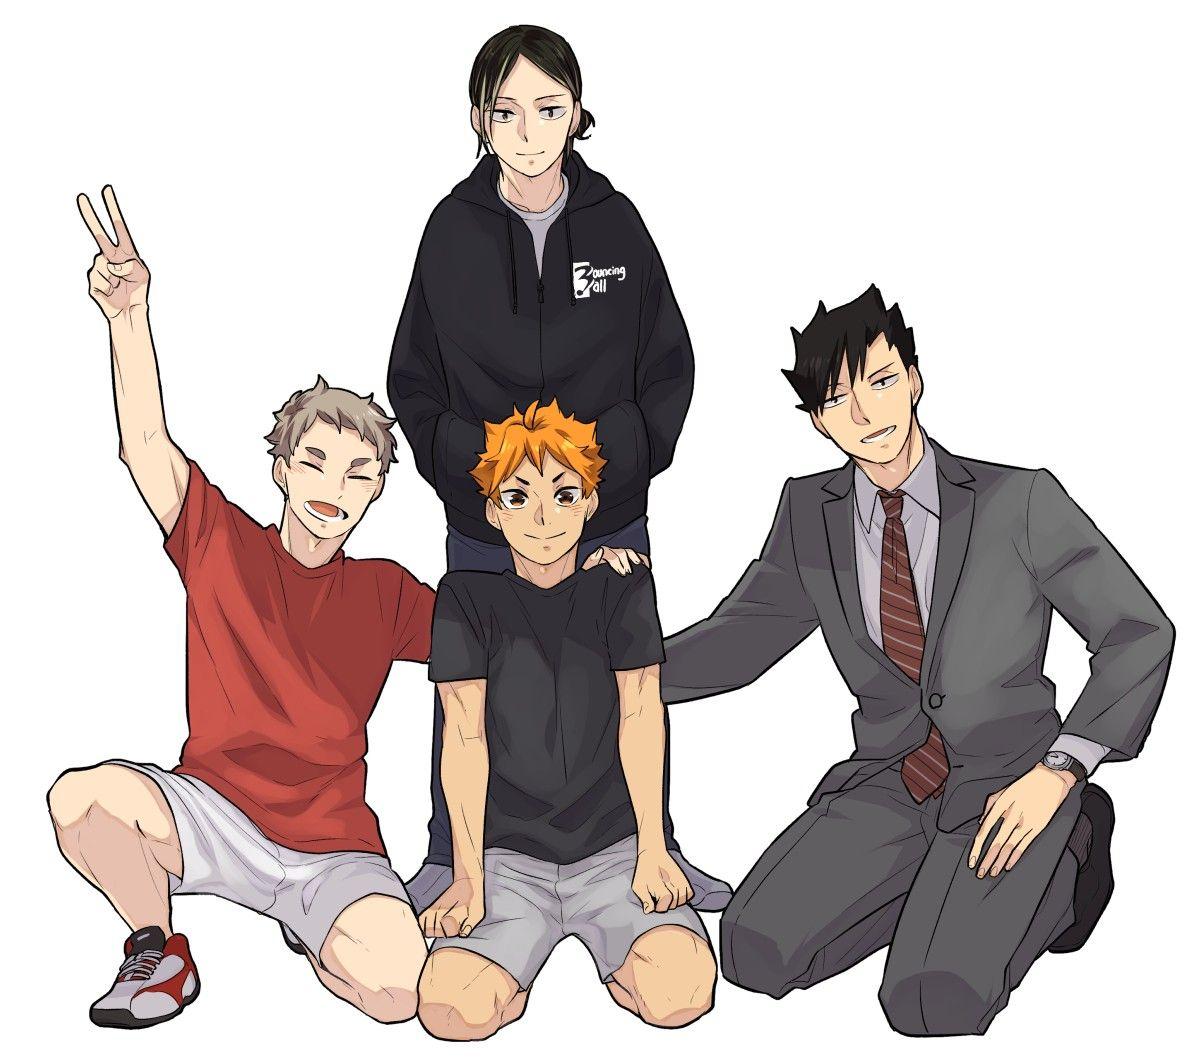 ♥Haikyuu!! ♥ハイキュー!! ♥排球少年 ♥排球少年!!♥anime